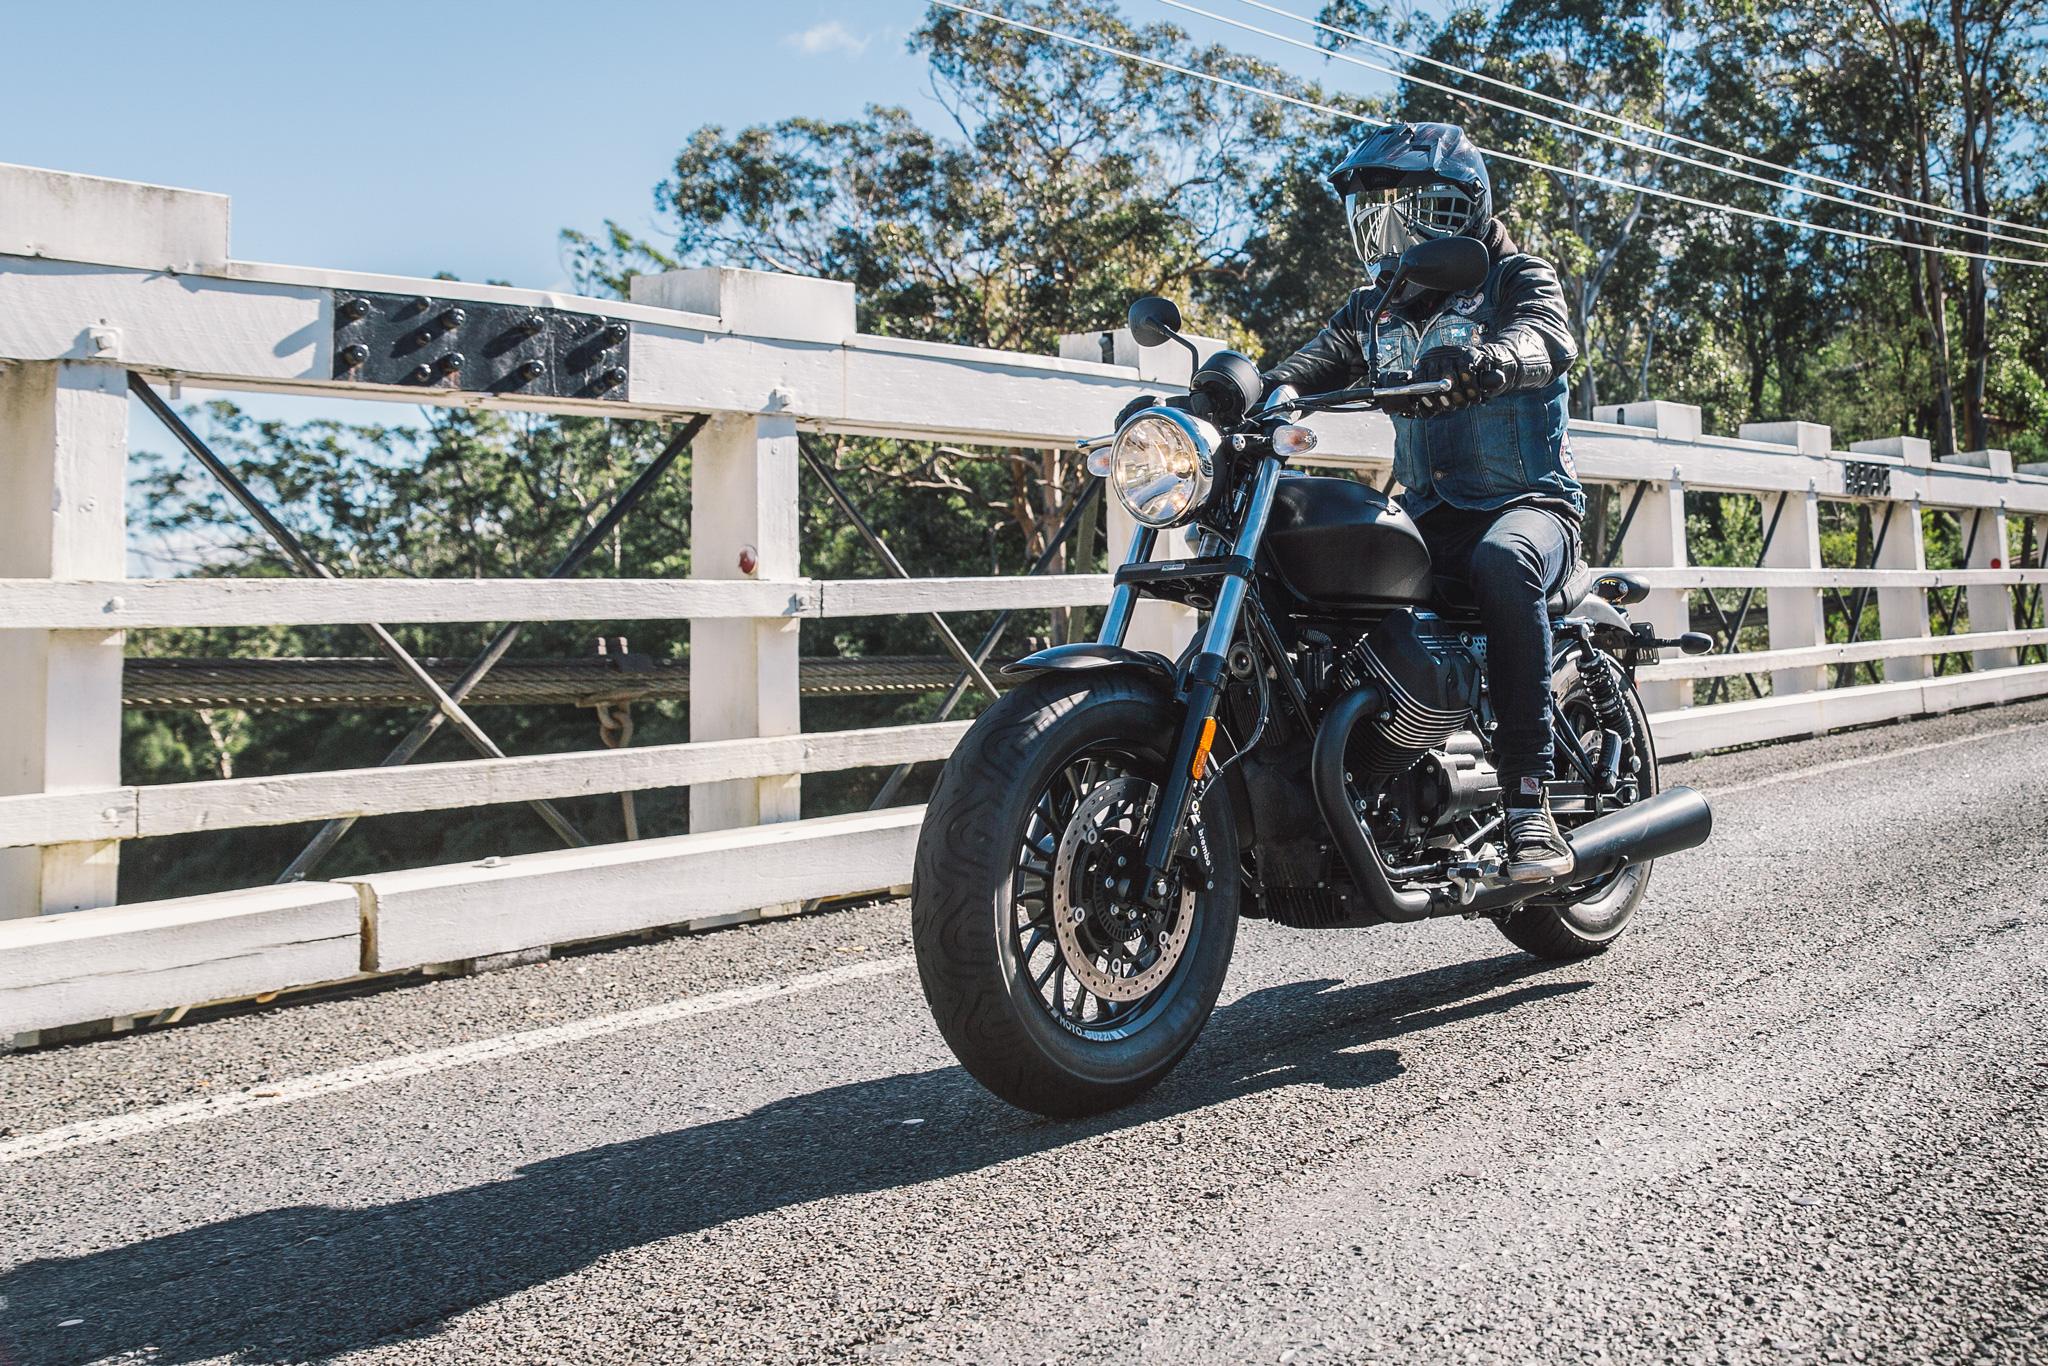 Moto-Guzzi_V9_Roamer_Bobber20160610 (7)